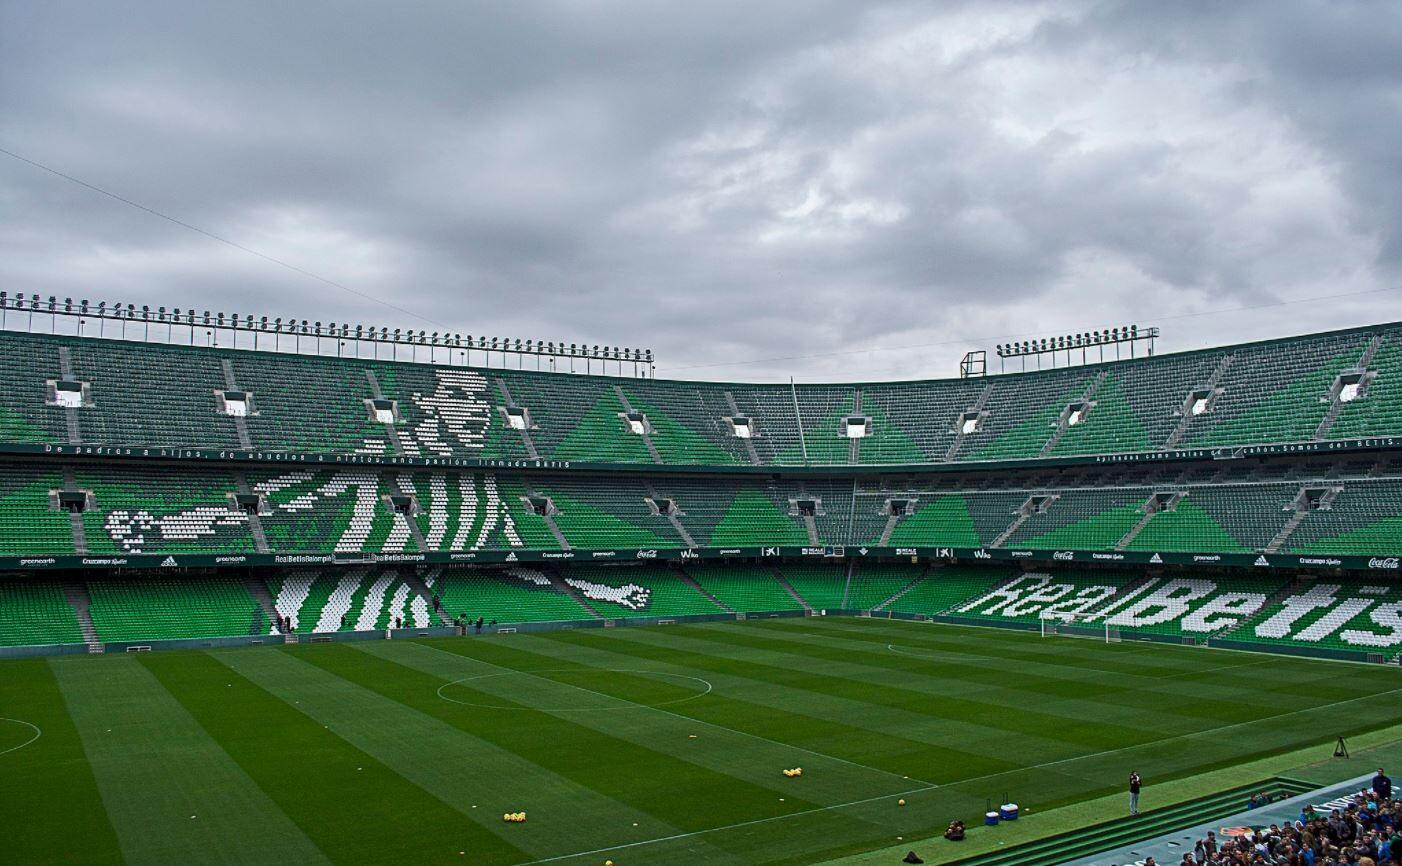 Estadio Benito Villamarín (Wikimedia Commons).